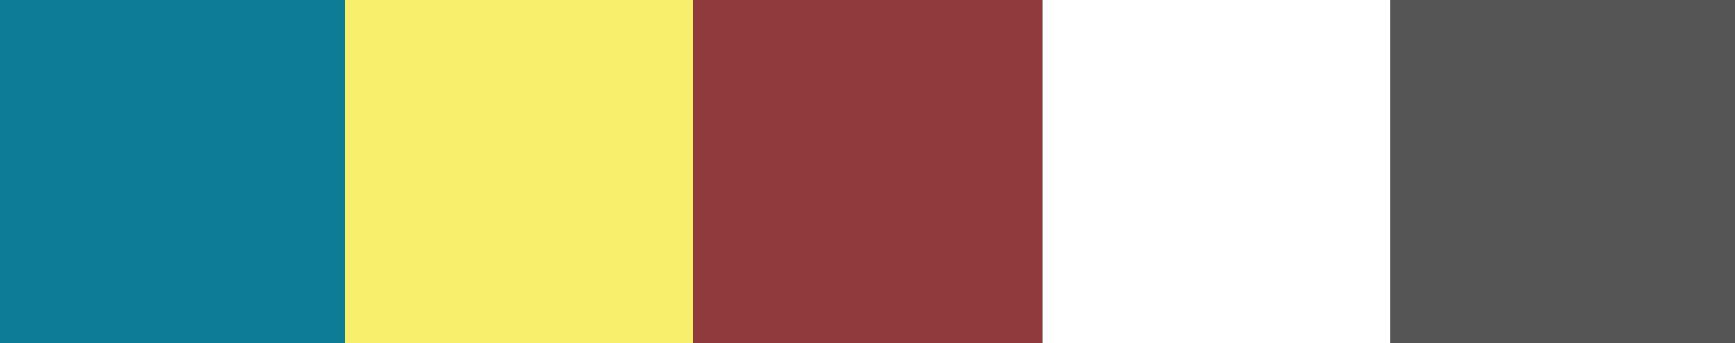 LiberJack Branding Colors